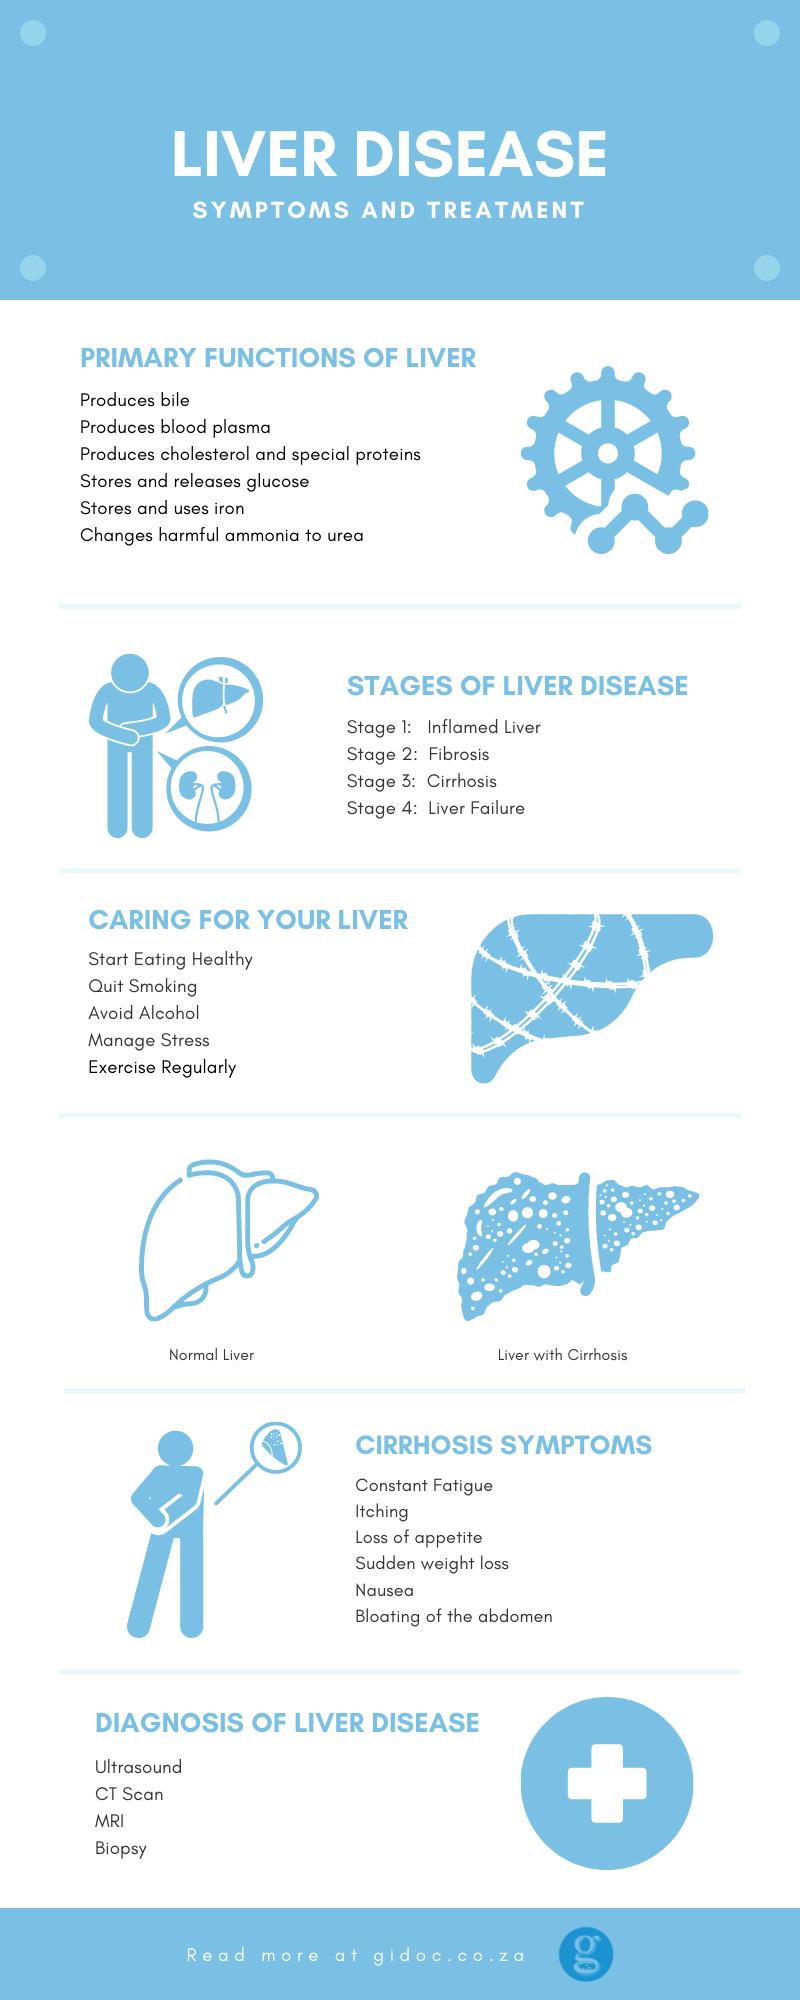 Liver Disease Symptoms Treatment infographic - Liver Disease: Symptoms and Treatment